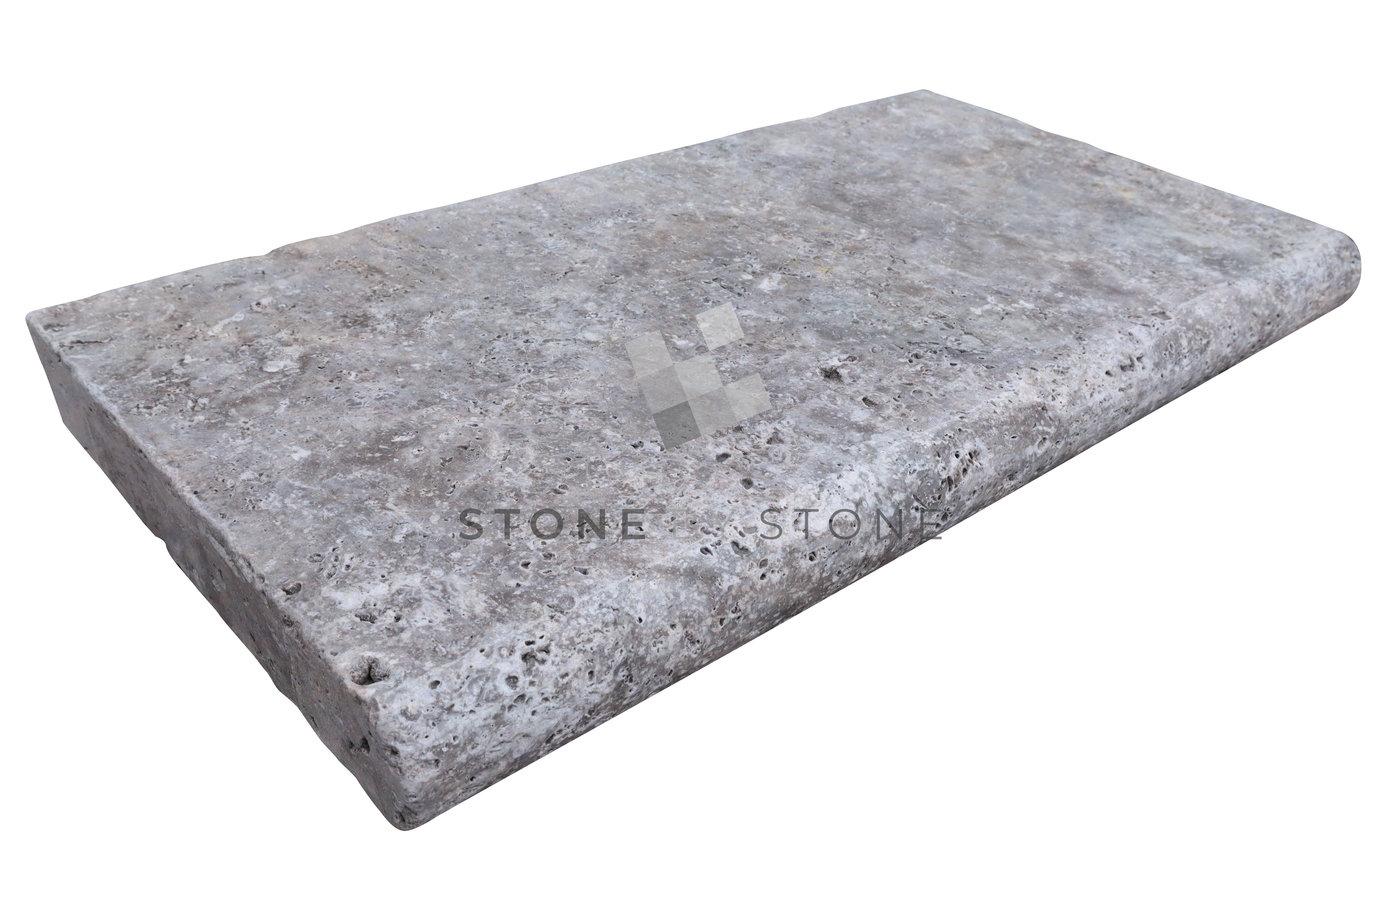 Margelle 33x61/5cm Bord rond - Travertin 1er Choix - Silver